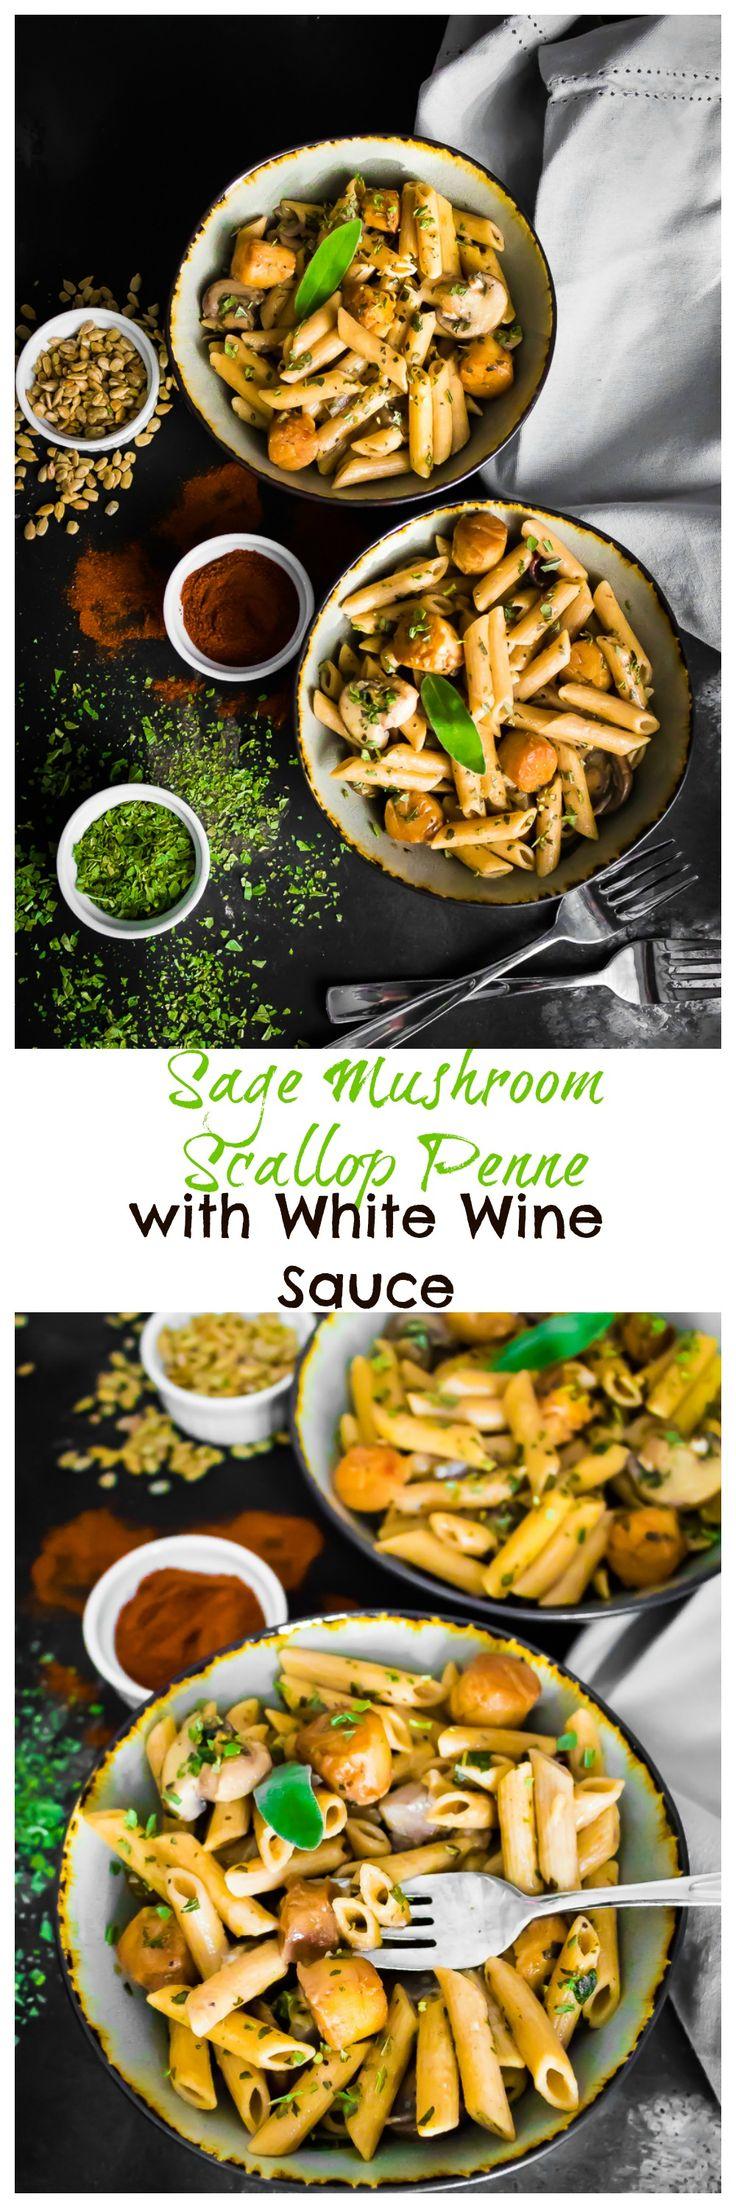 Sage Mushroom Scallop Penne with White Wine Sauce | recipes | recipe | fancy | dinner party | ideas | holidays | thanksgiving | christmas | festive | menu | pasta| Italian food | veggies |